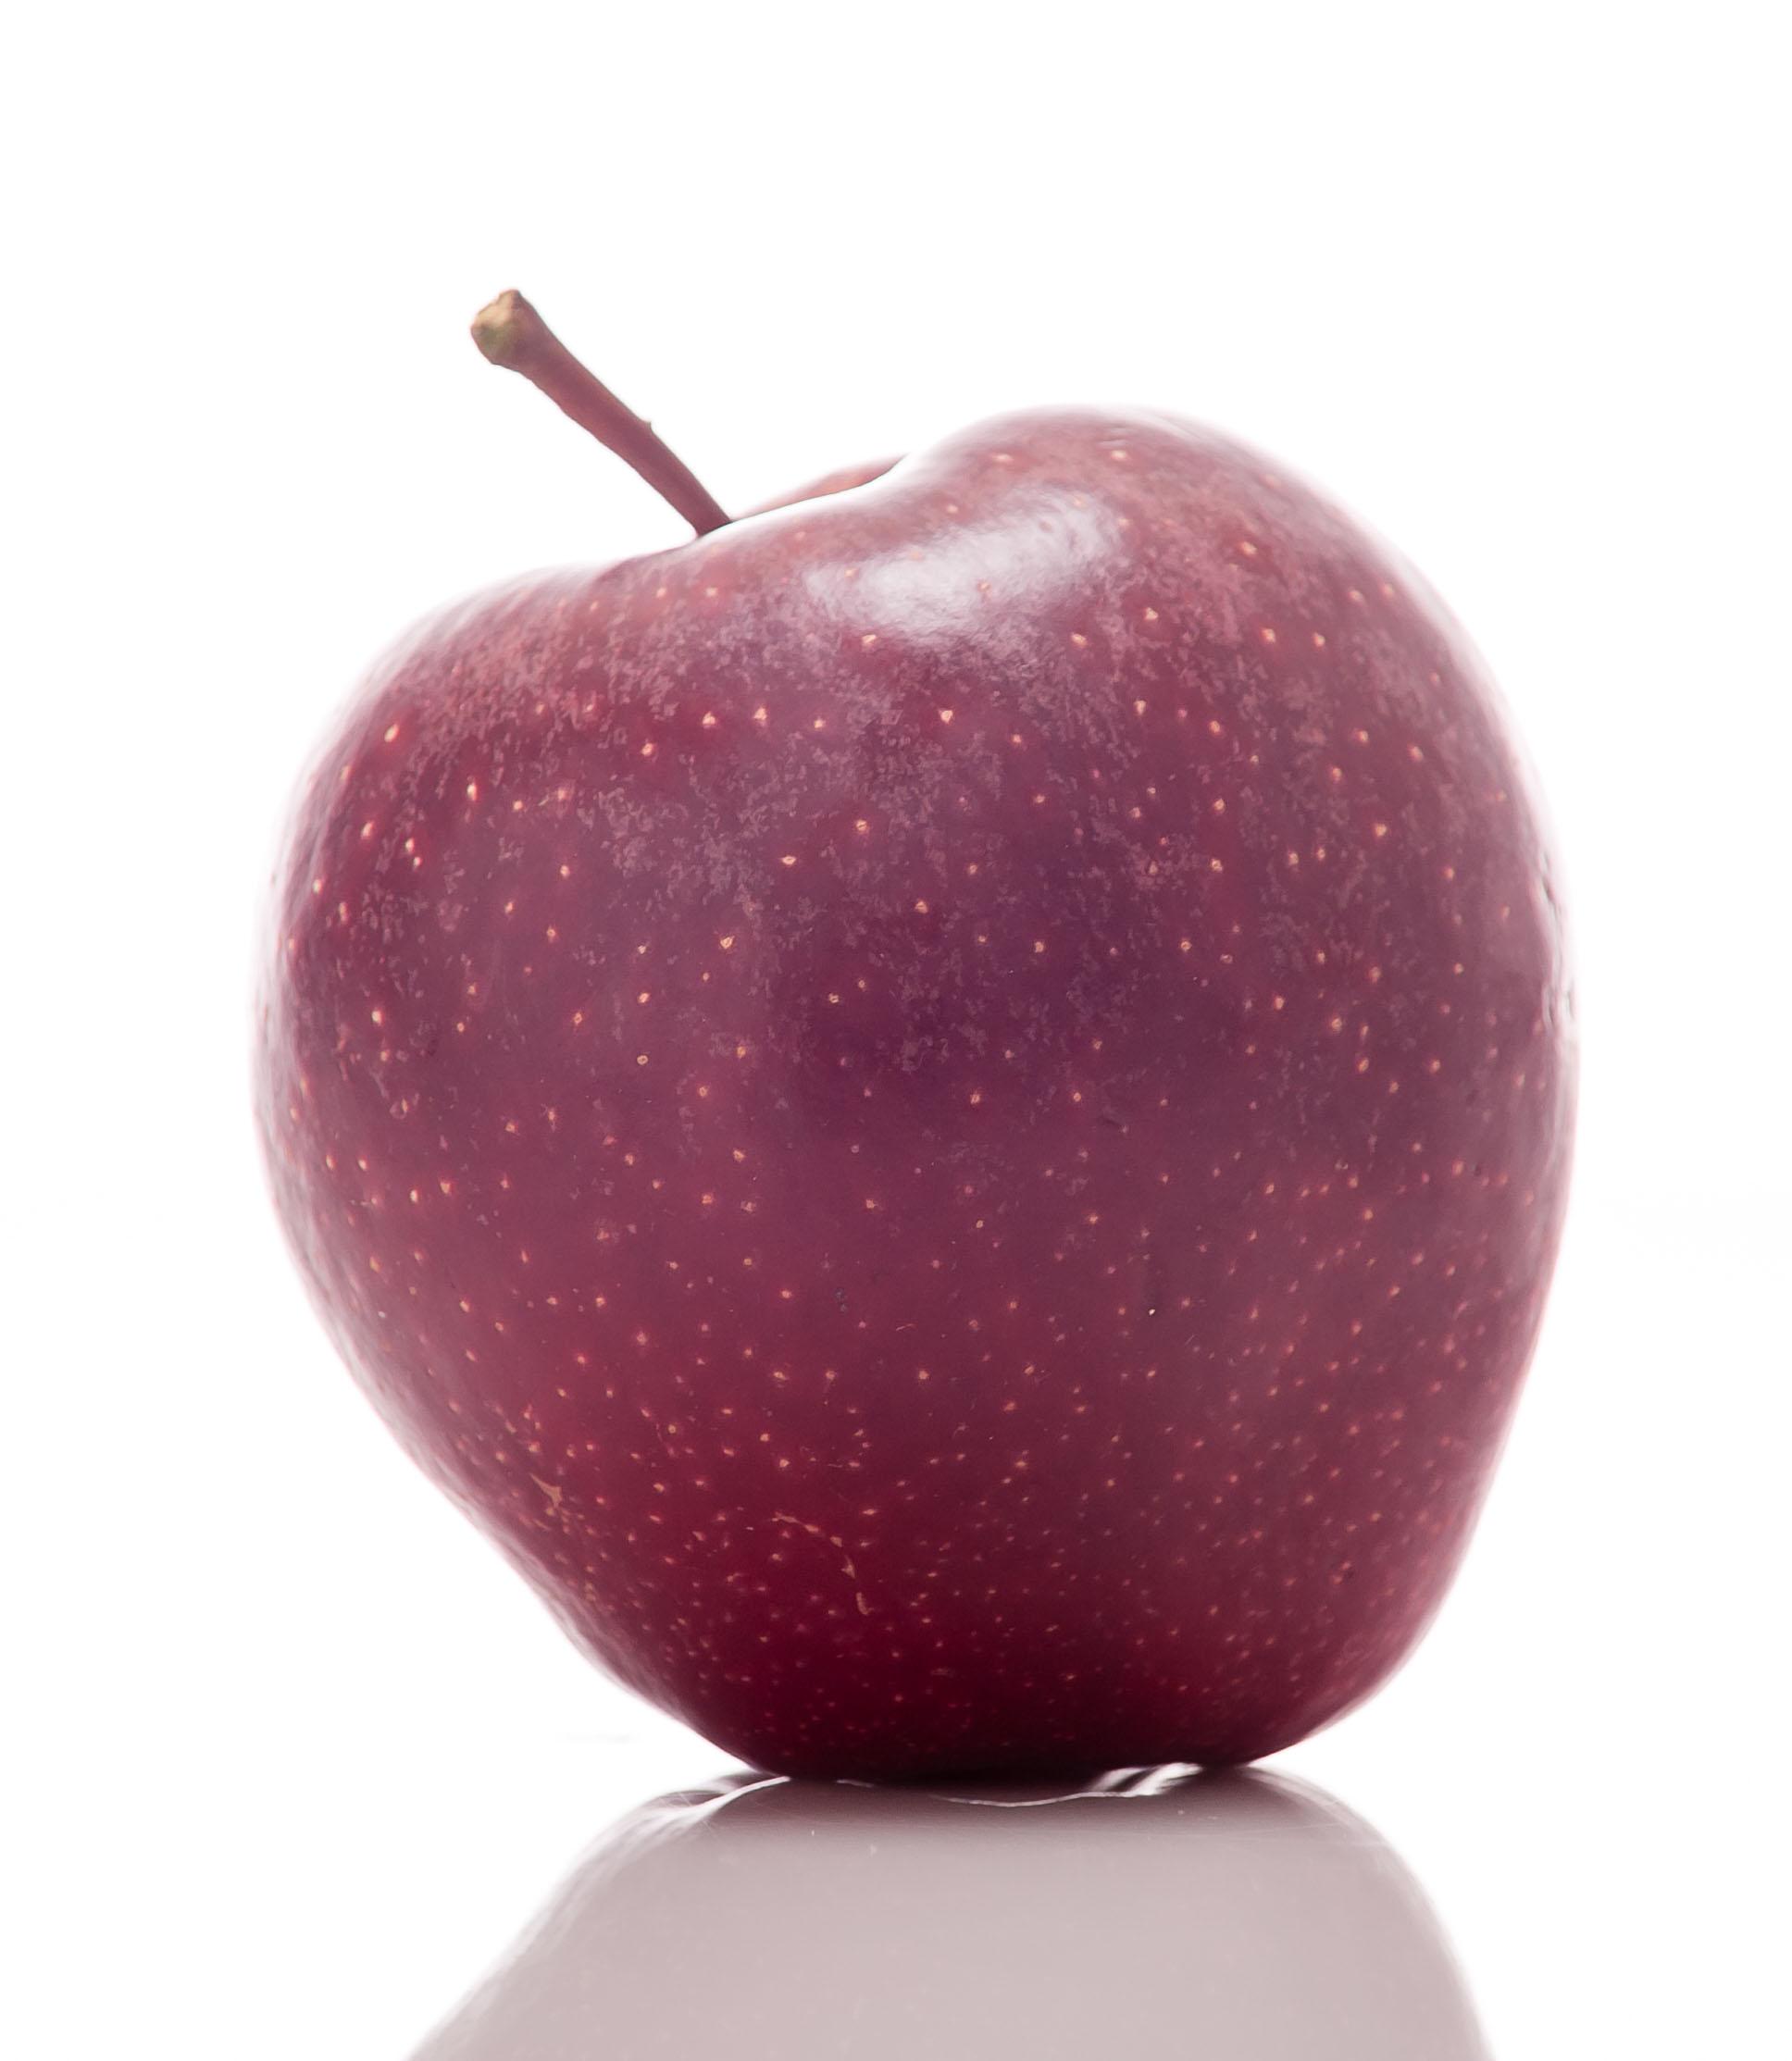 Bigbucks Apples, South Africa - Per Kg